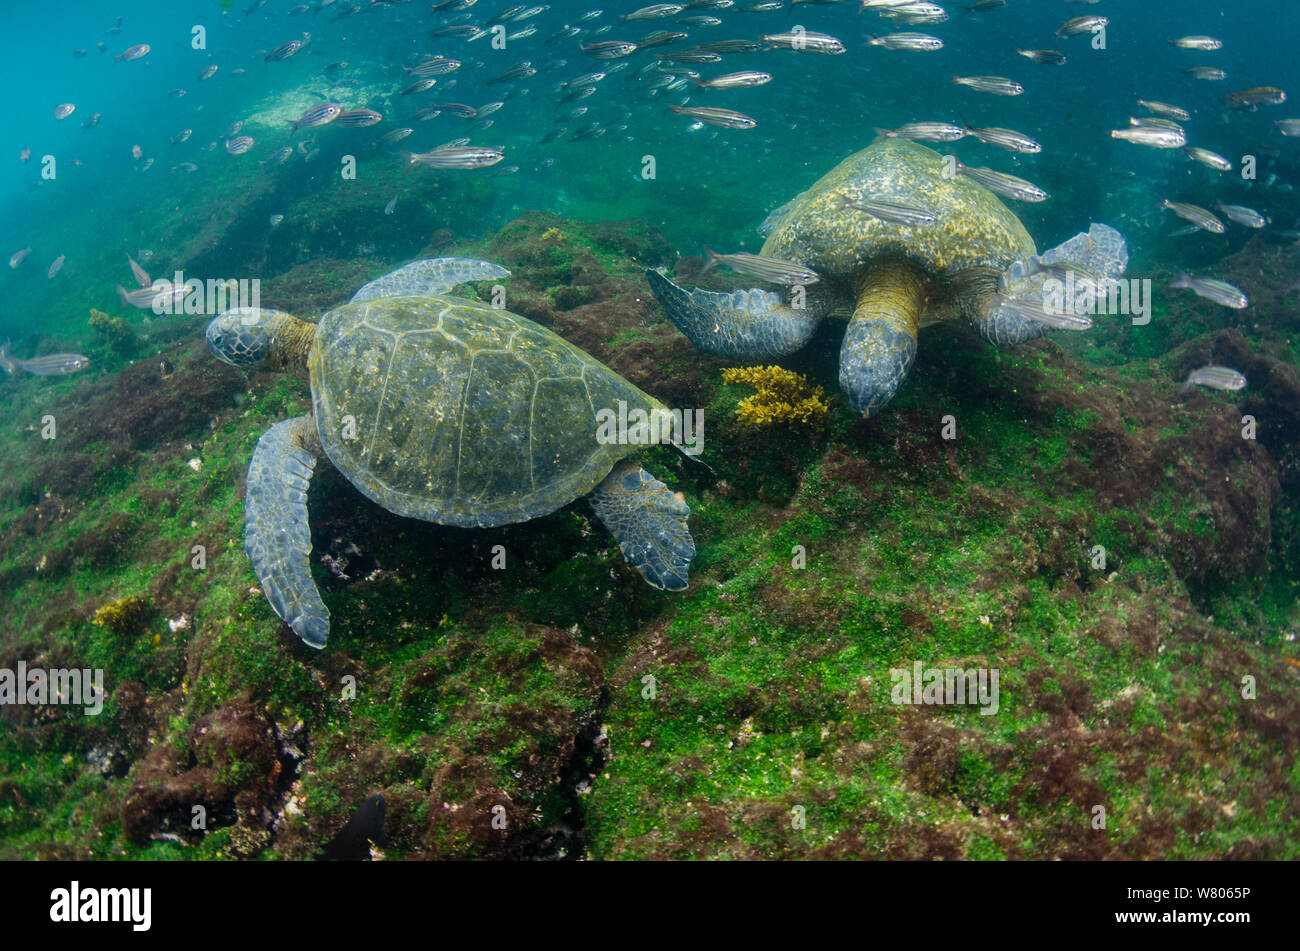 Galapagos green sea turtles (Chelonia mydas agassizi) two underwater. Galapagos. Stock Photo